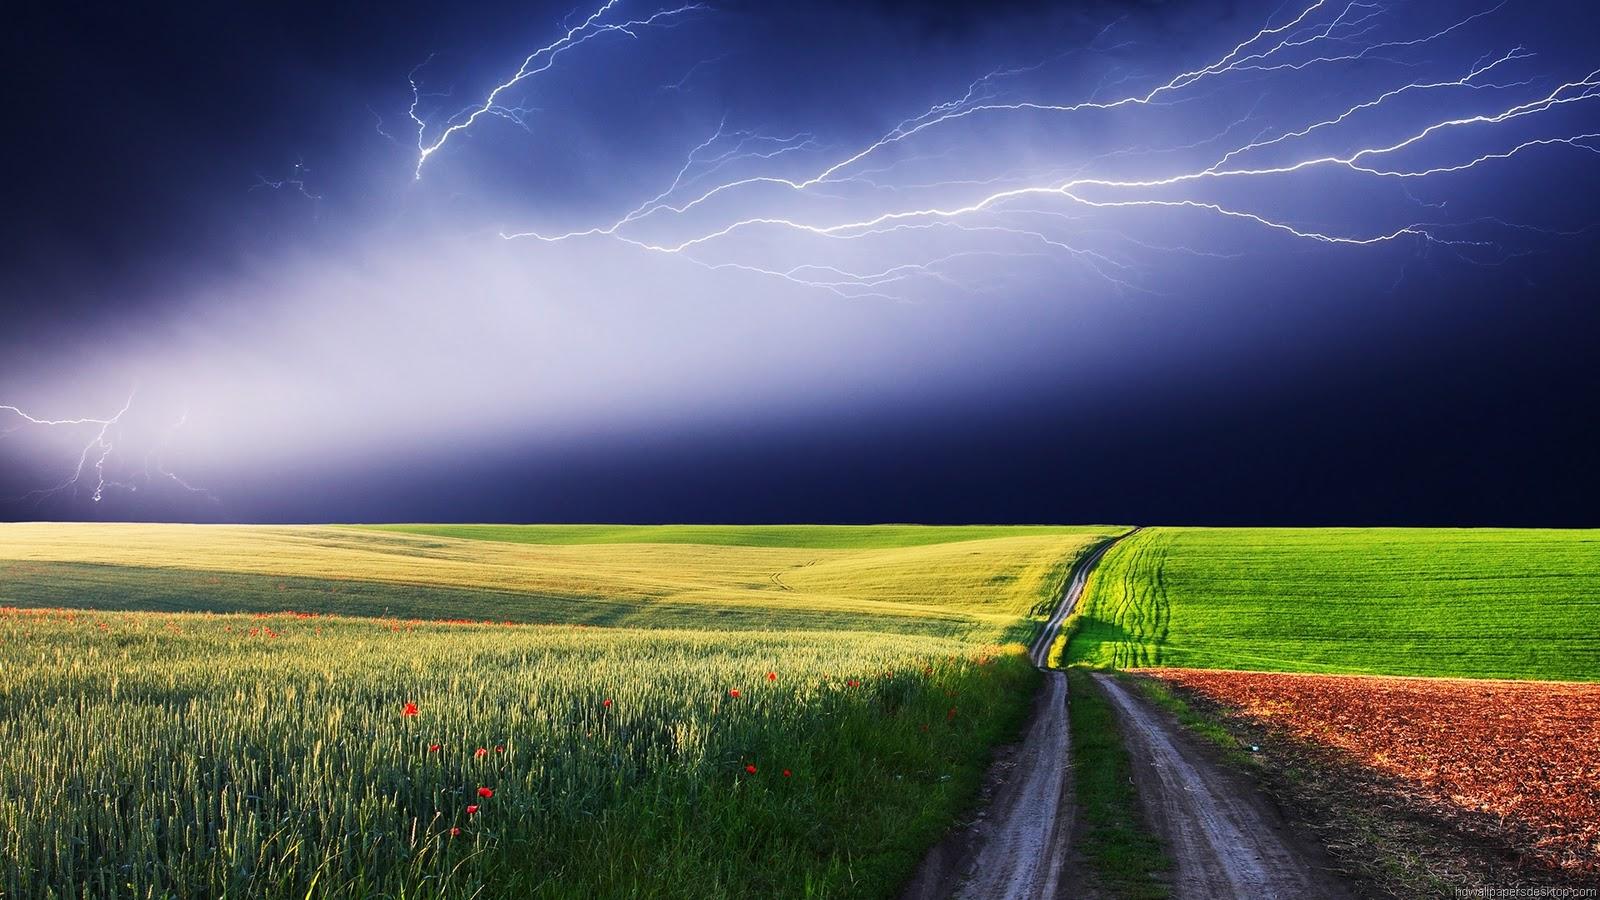 epic nature wallpaper - photo #33